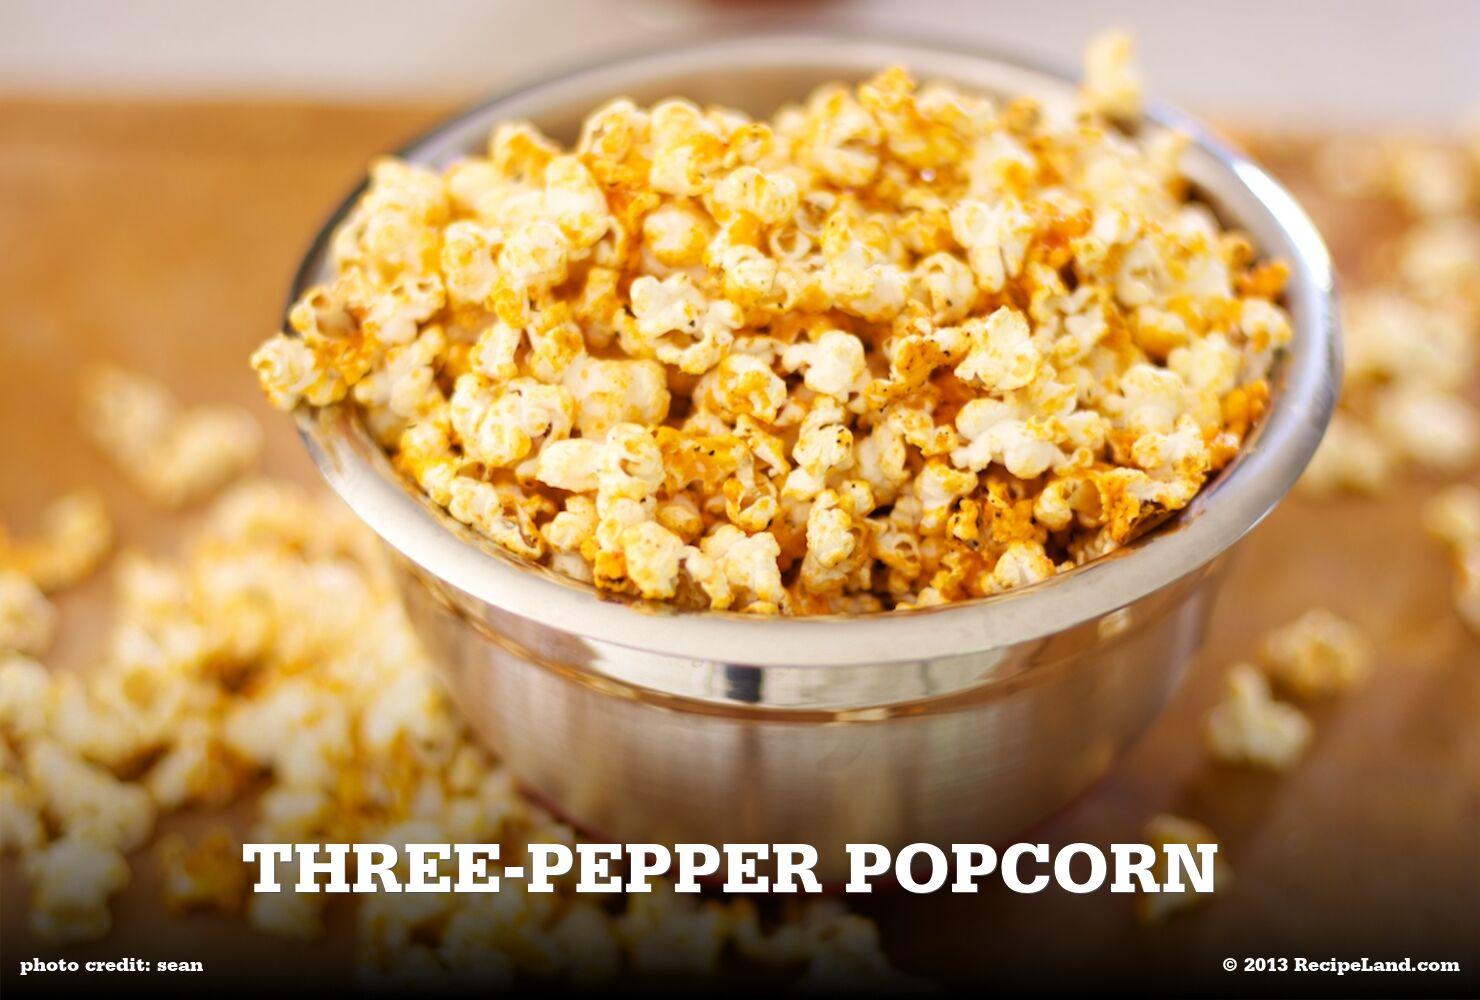 Three-Pepper Popcorn